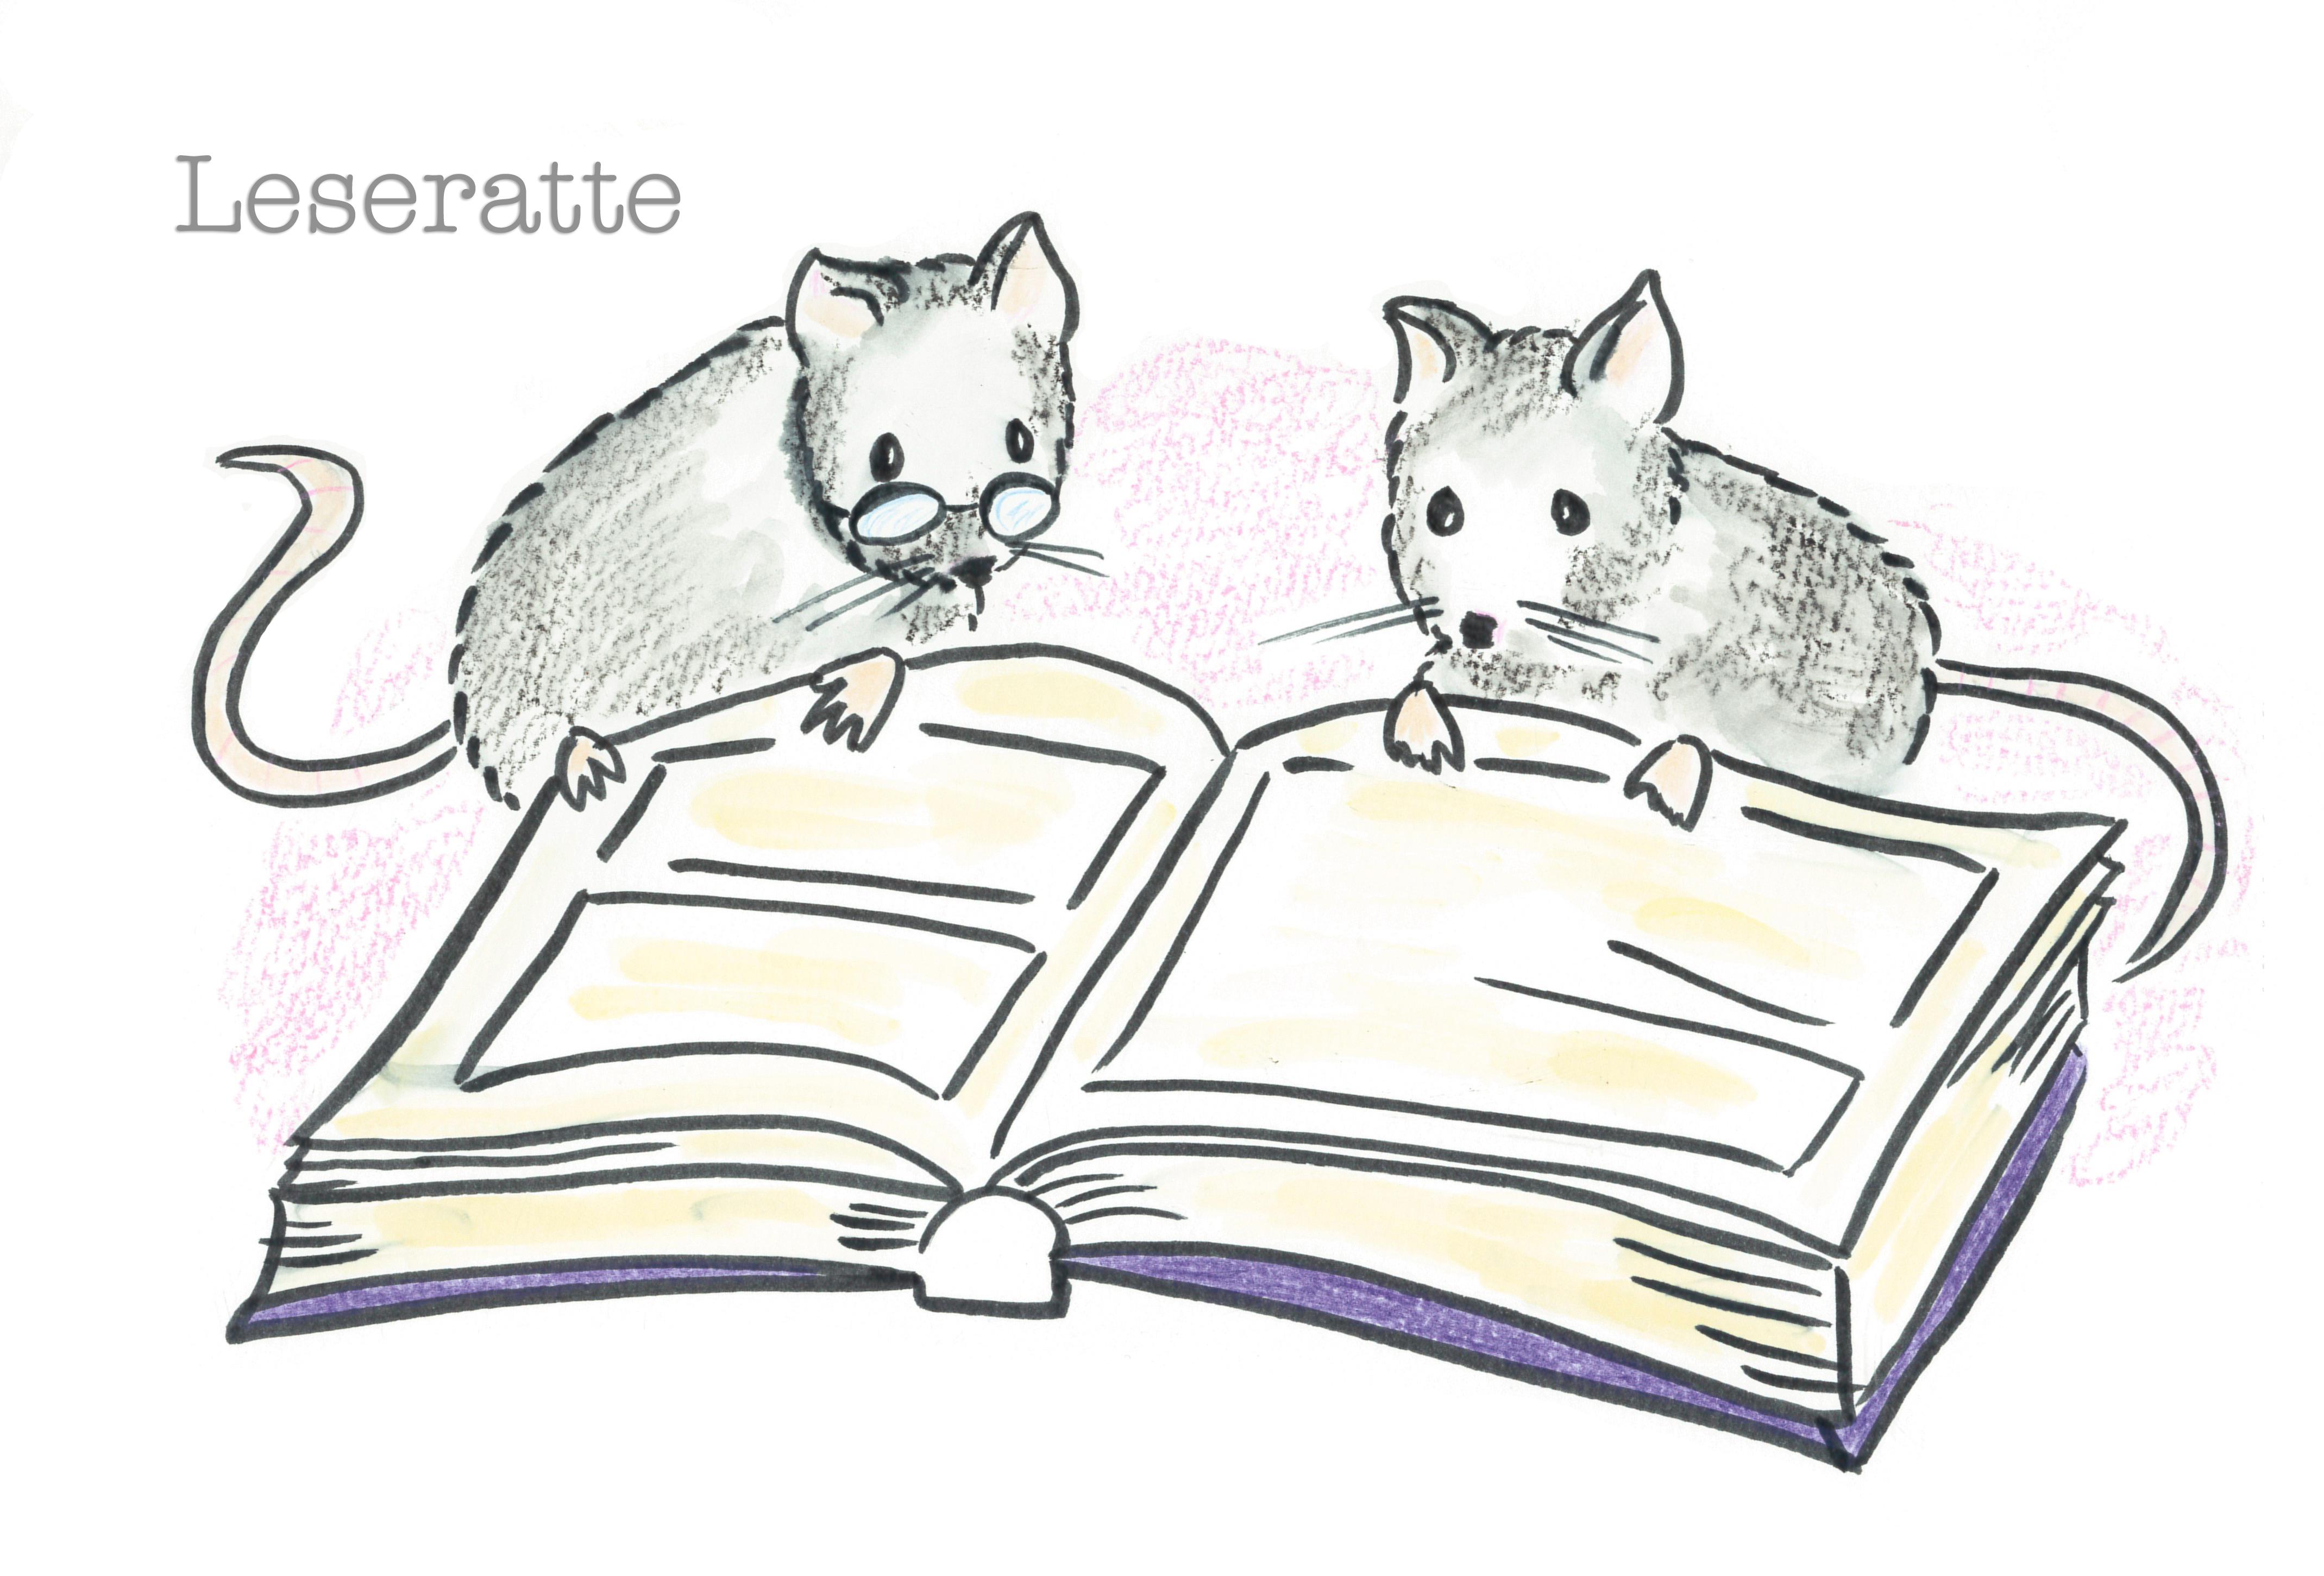 Leseratte